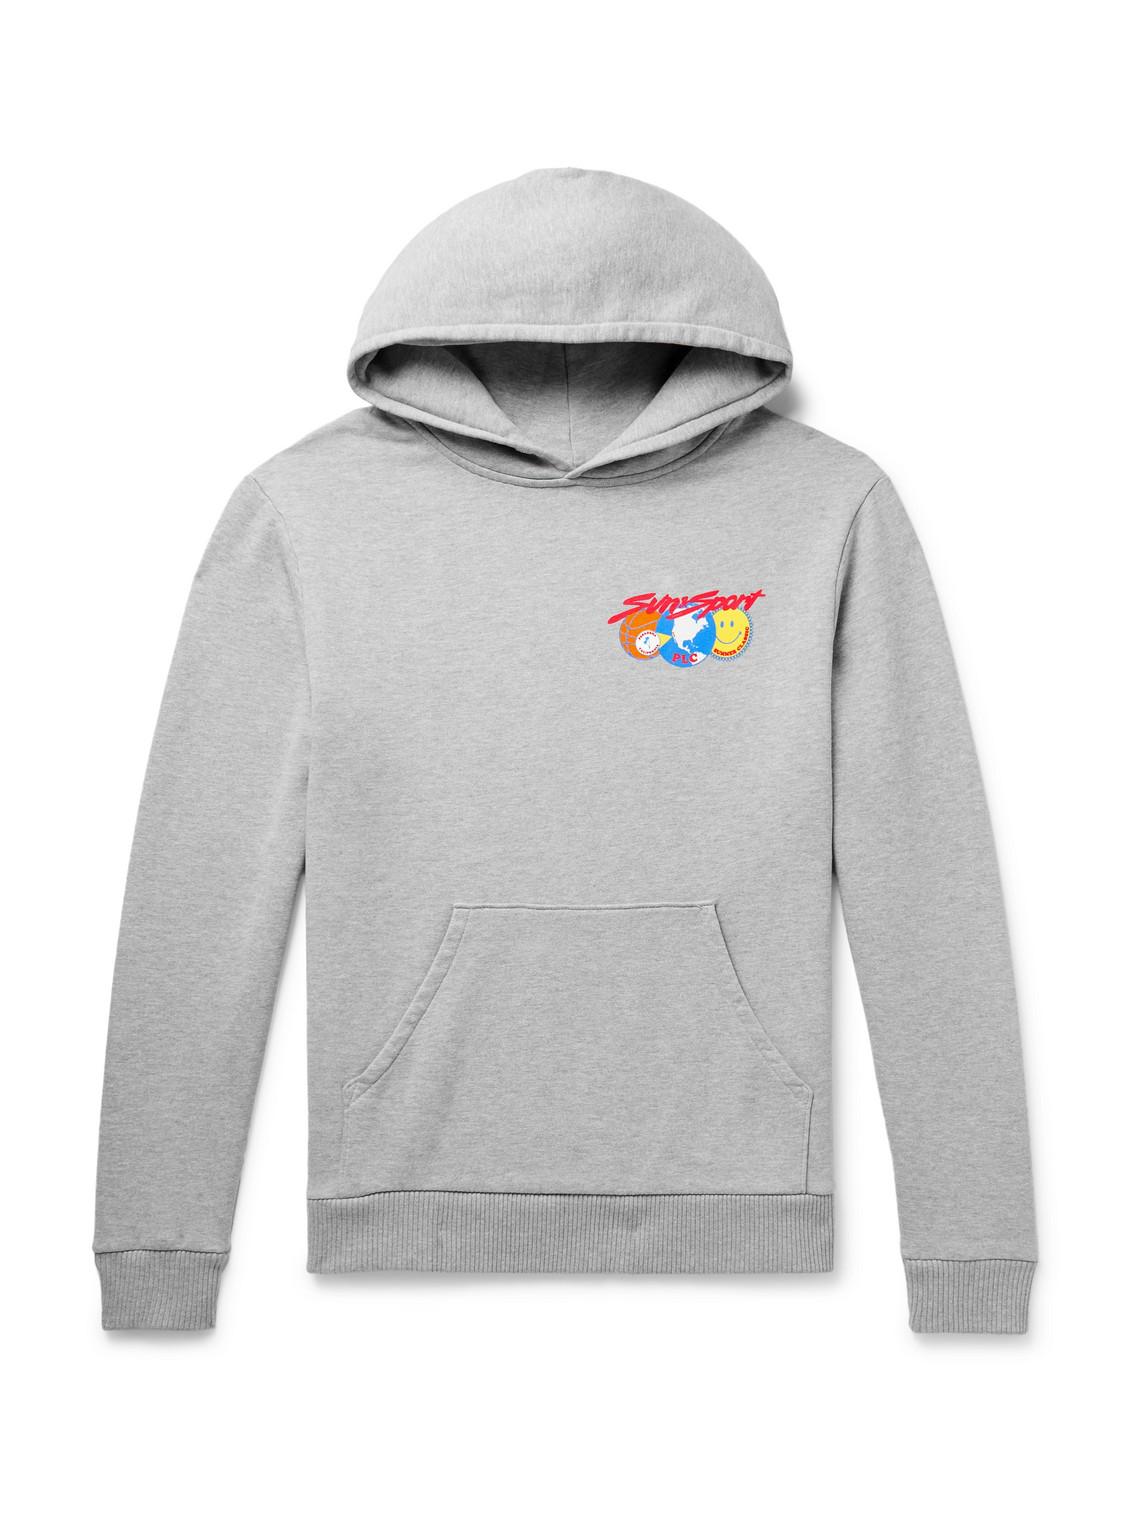 pasadena leisure club - sun amp; sport printed mélange fleece-back cotton-blend jersey hoodie - men - gray - l